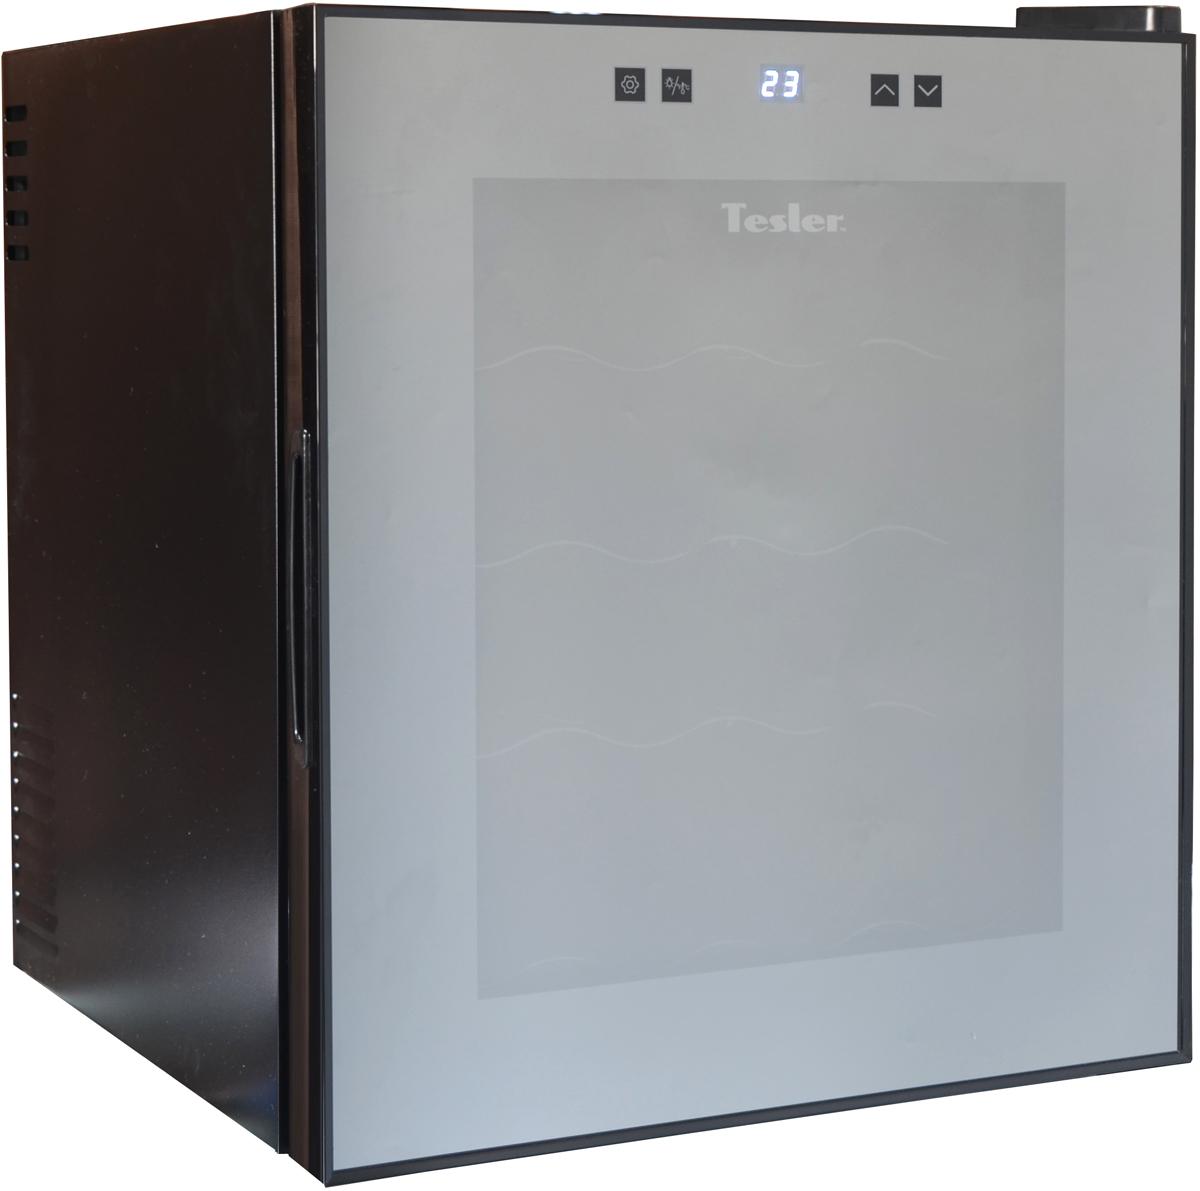 лучшая цена Винный шкаф Tesler WCV-160, Black